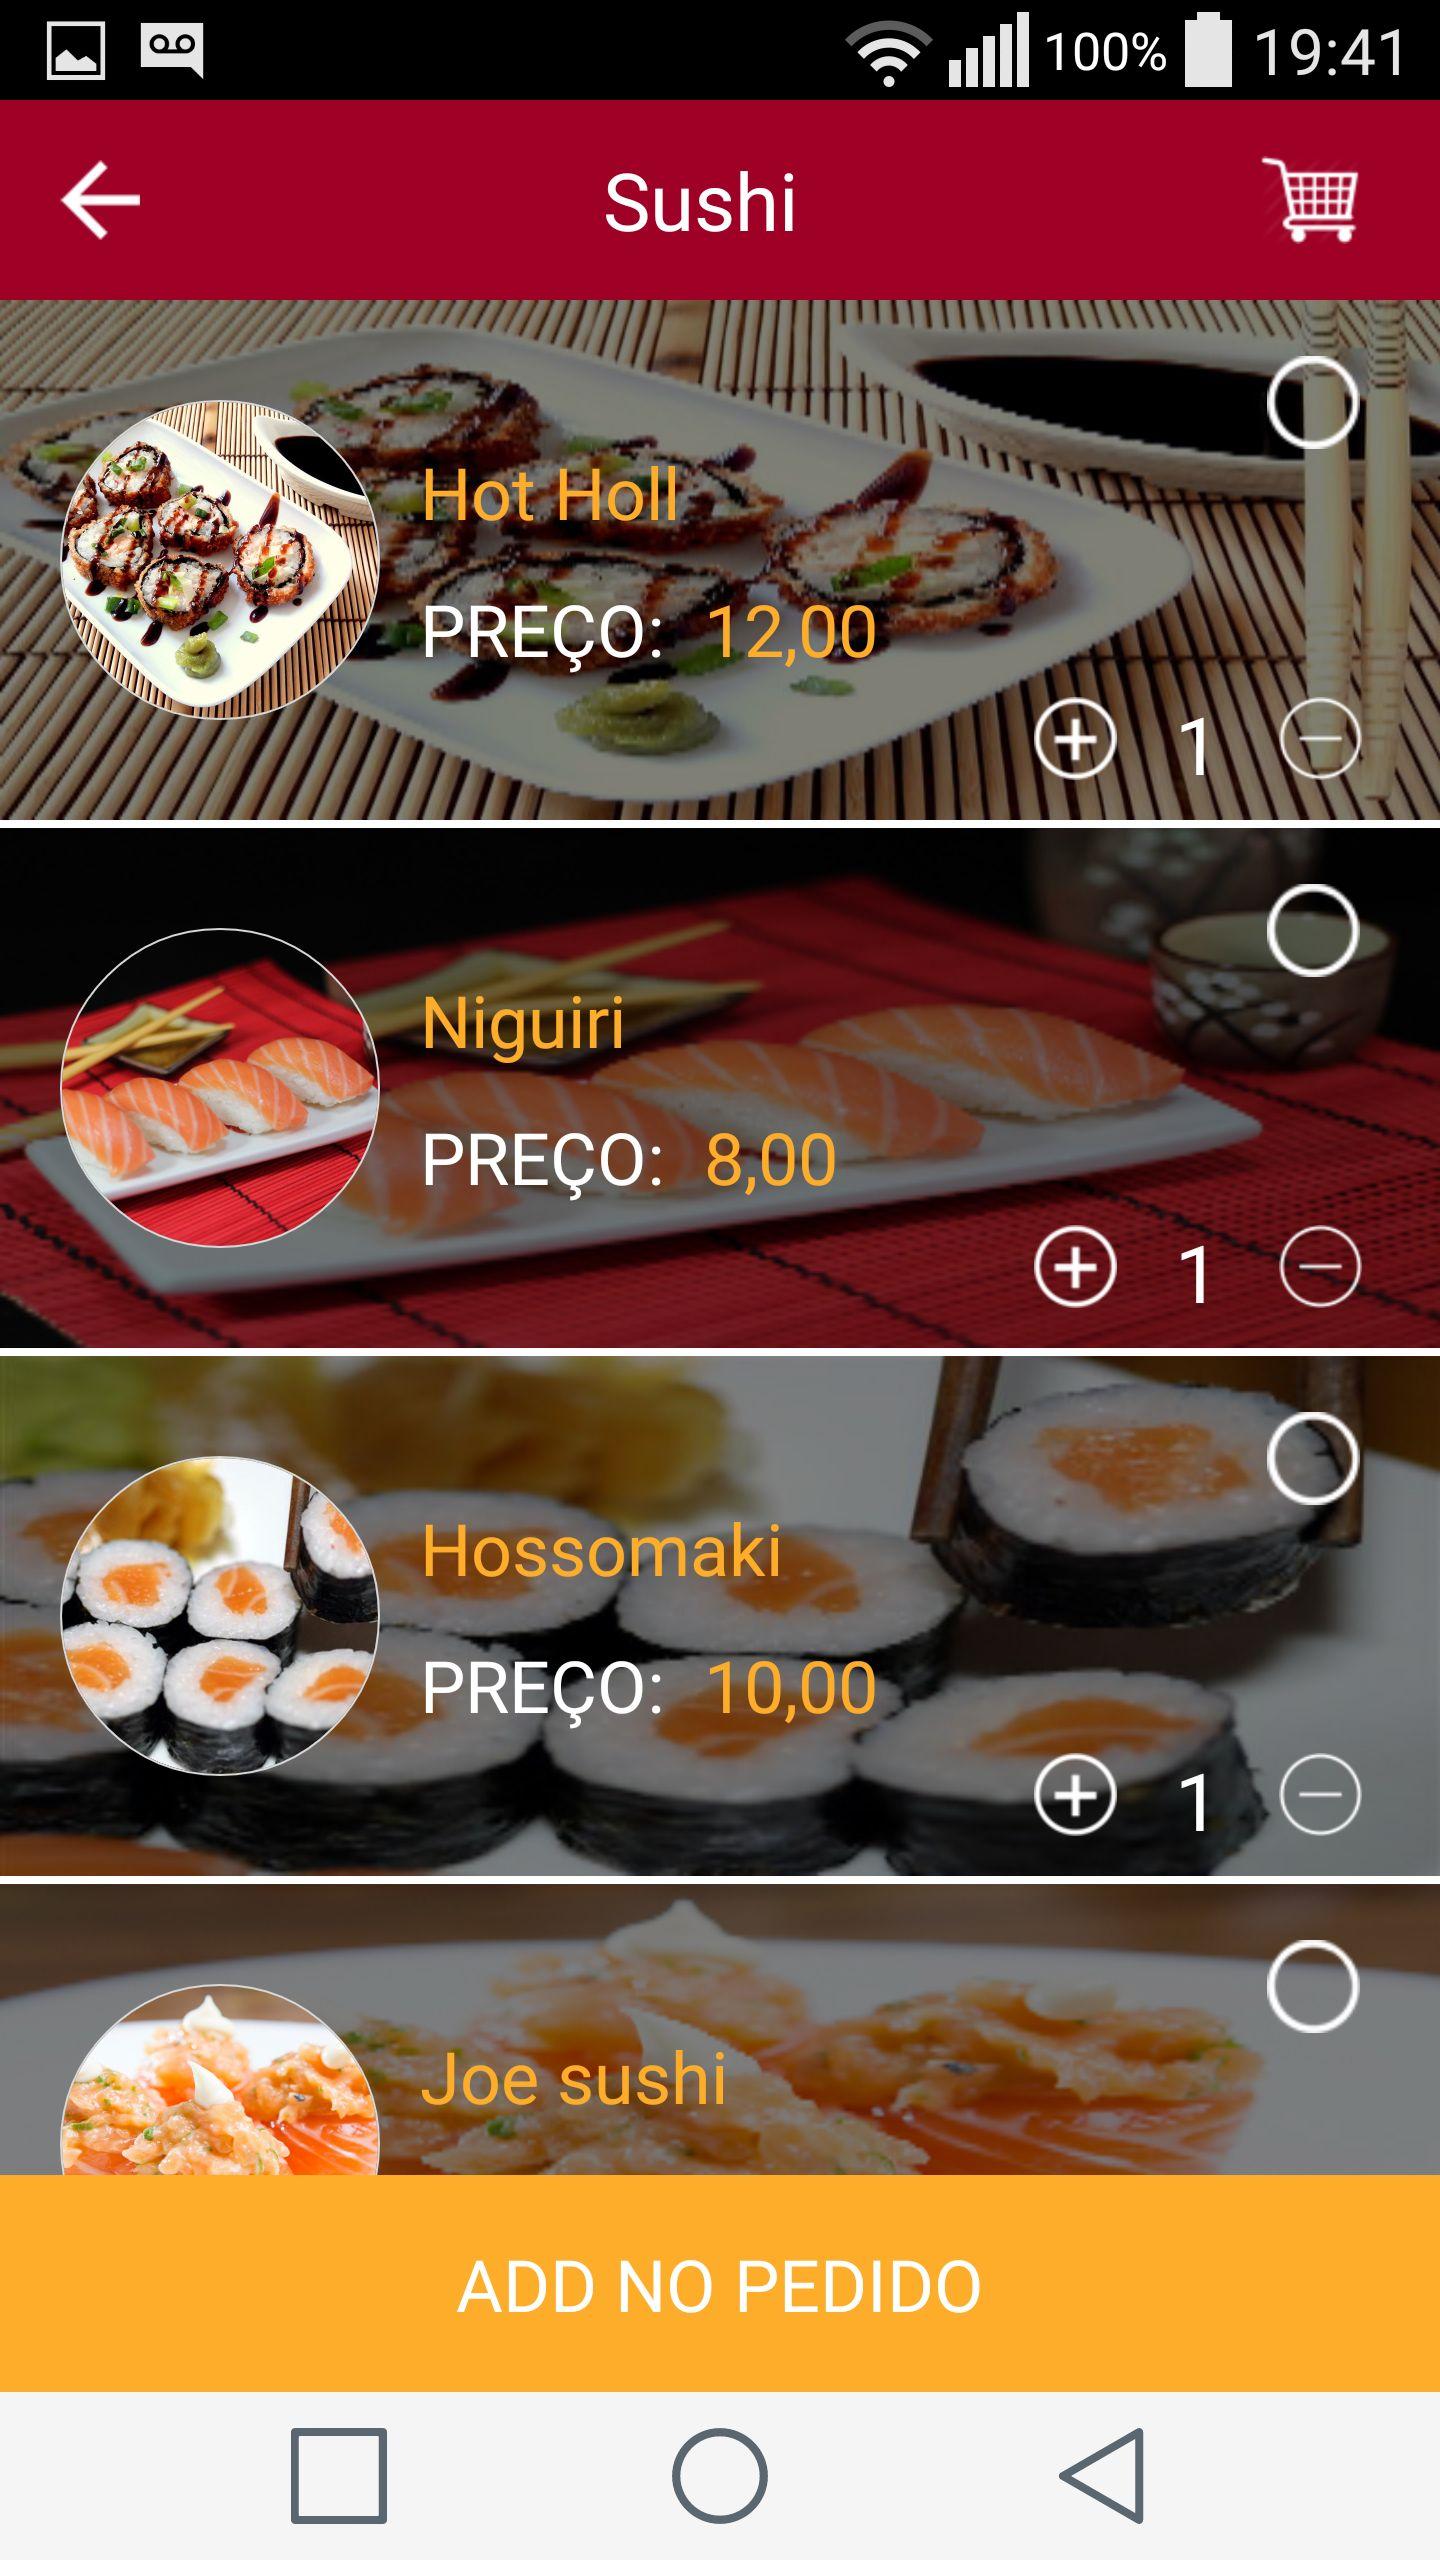 Restaurant app android ios source code food app templates for restaurant app android ios source code screenshot 3 forumfinder Gallery